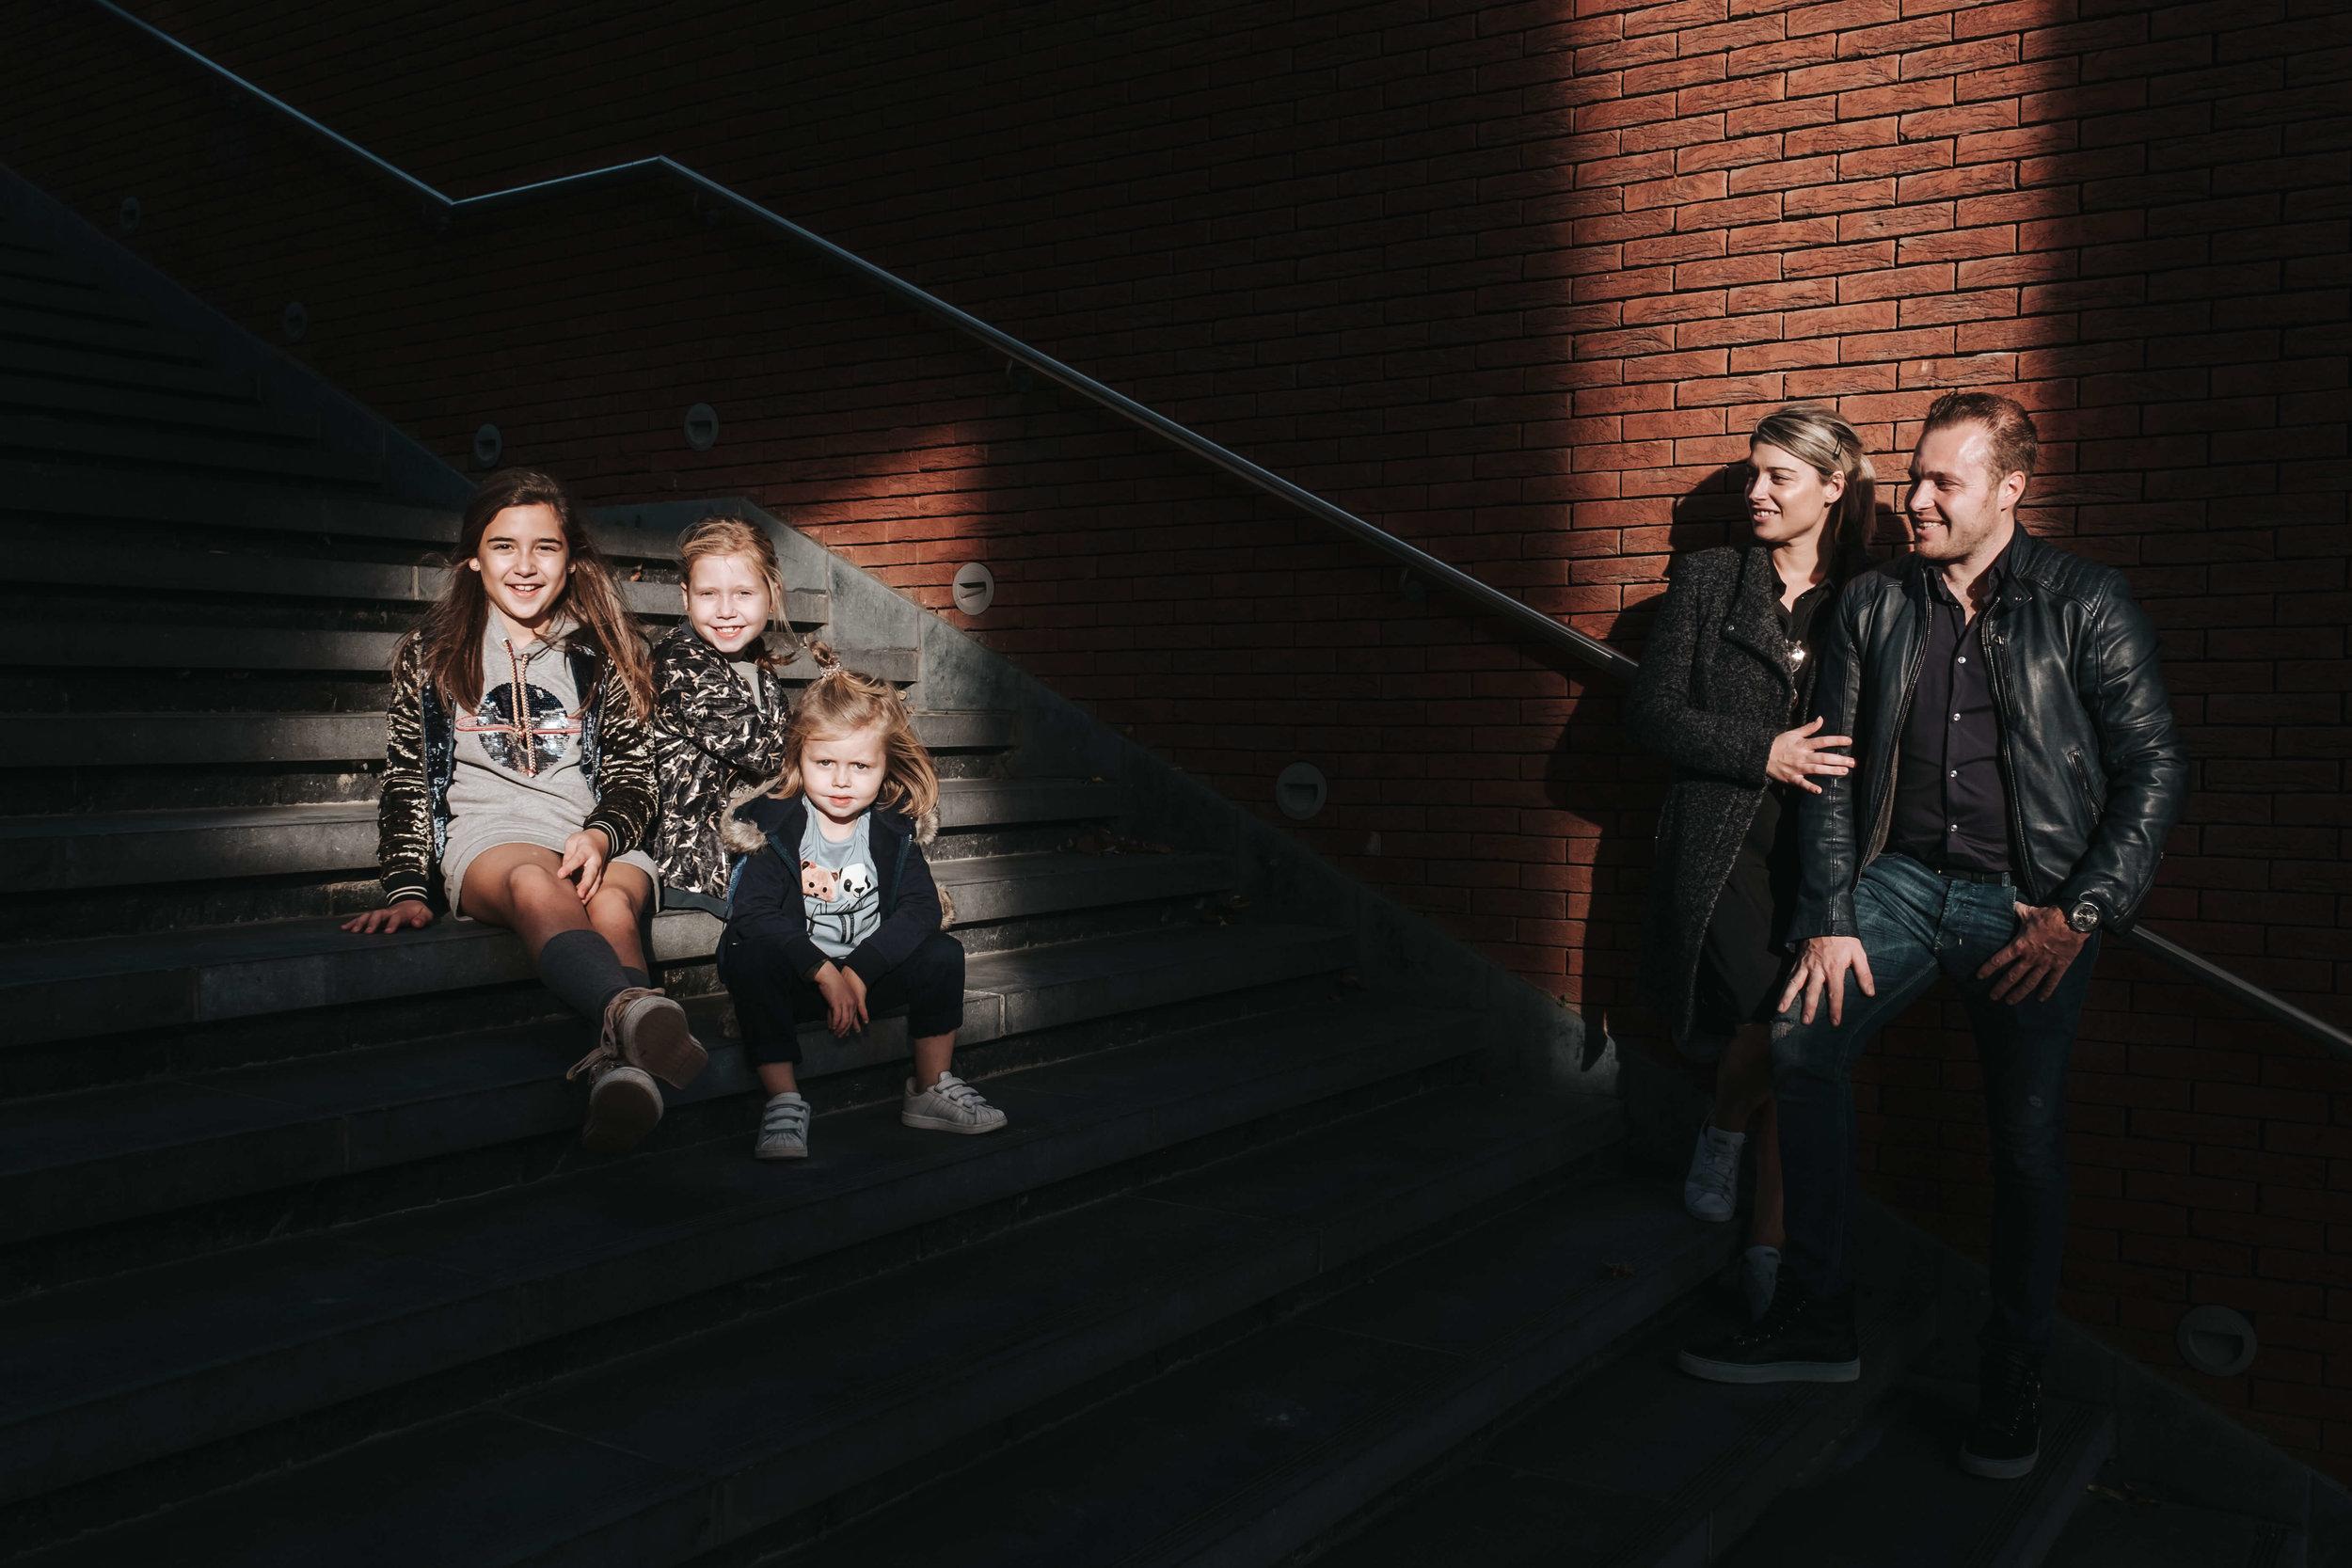 Sophie & Co  Familie urban setting